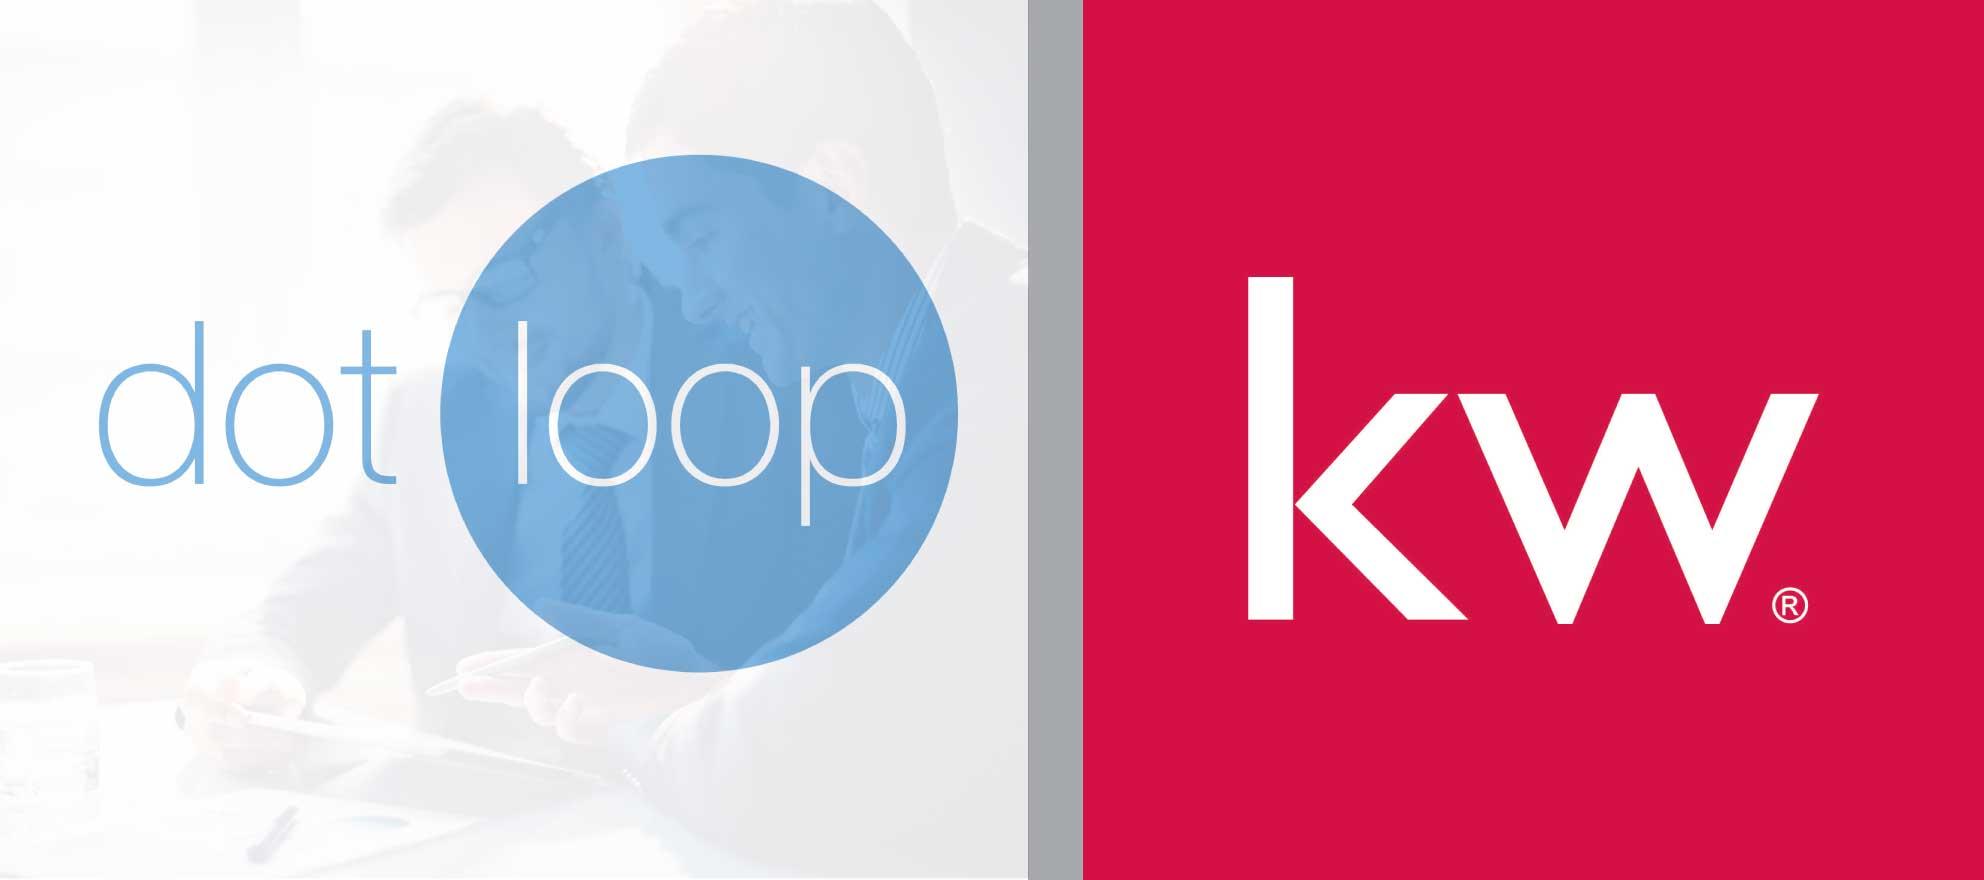 Keller Williams re-ups with dotloop for 5 more years